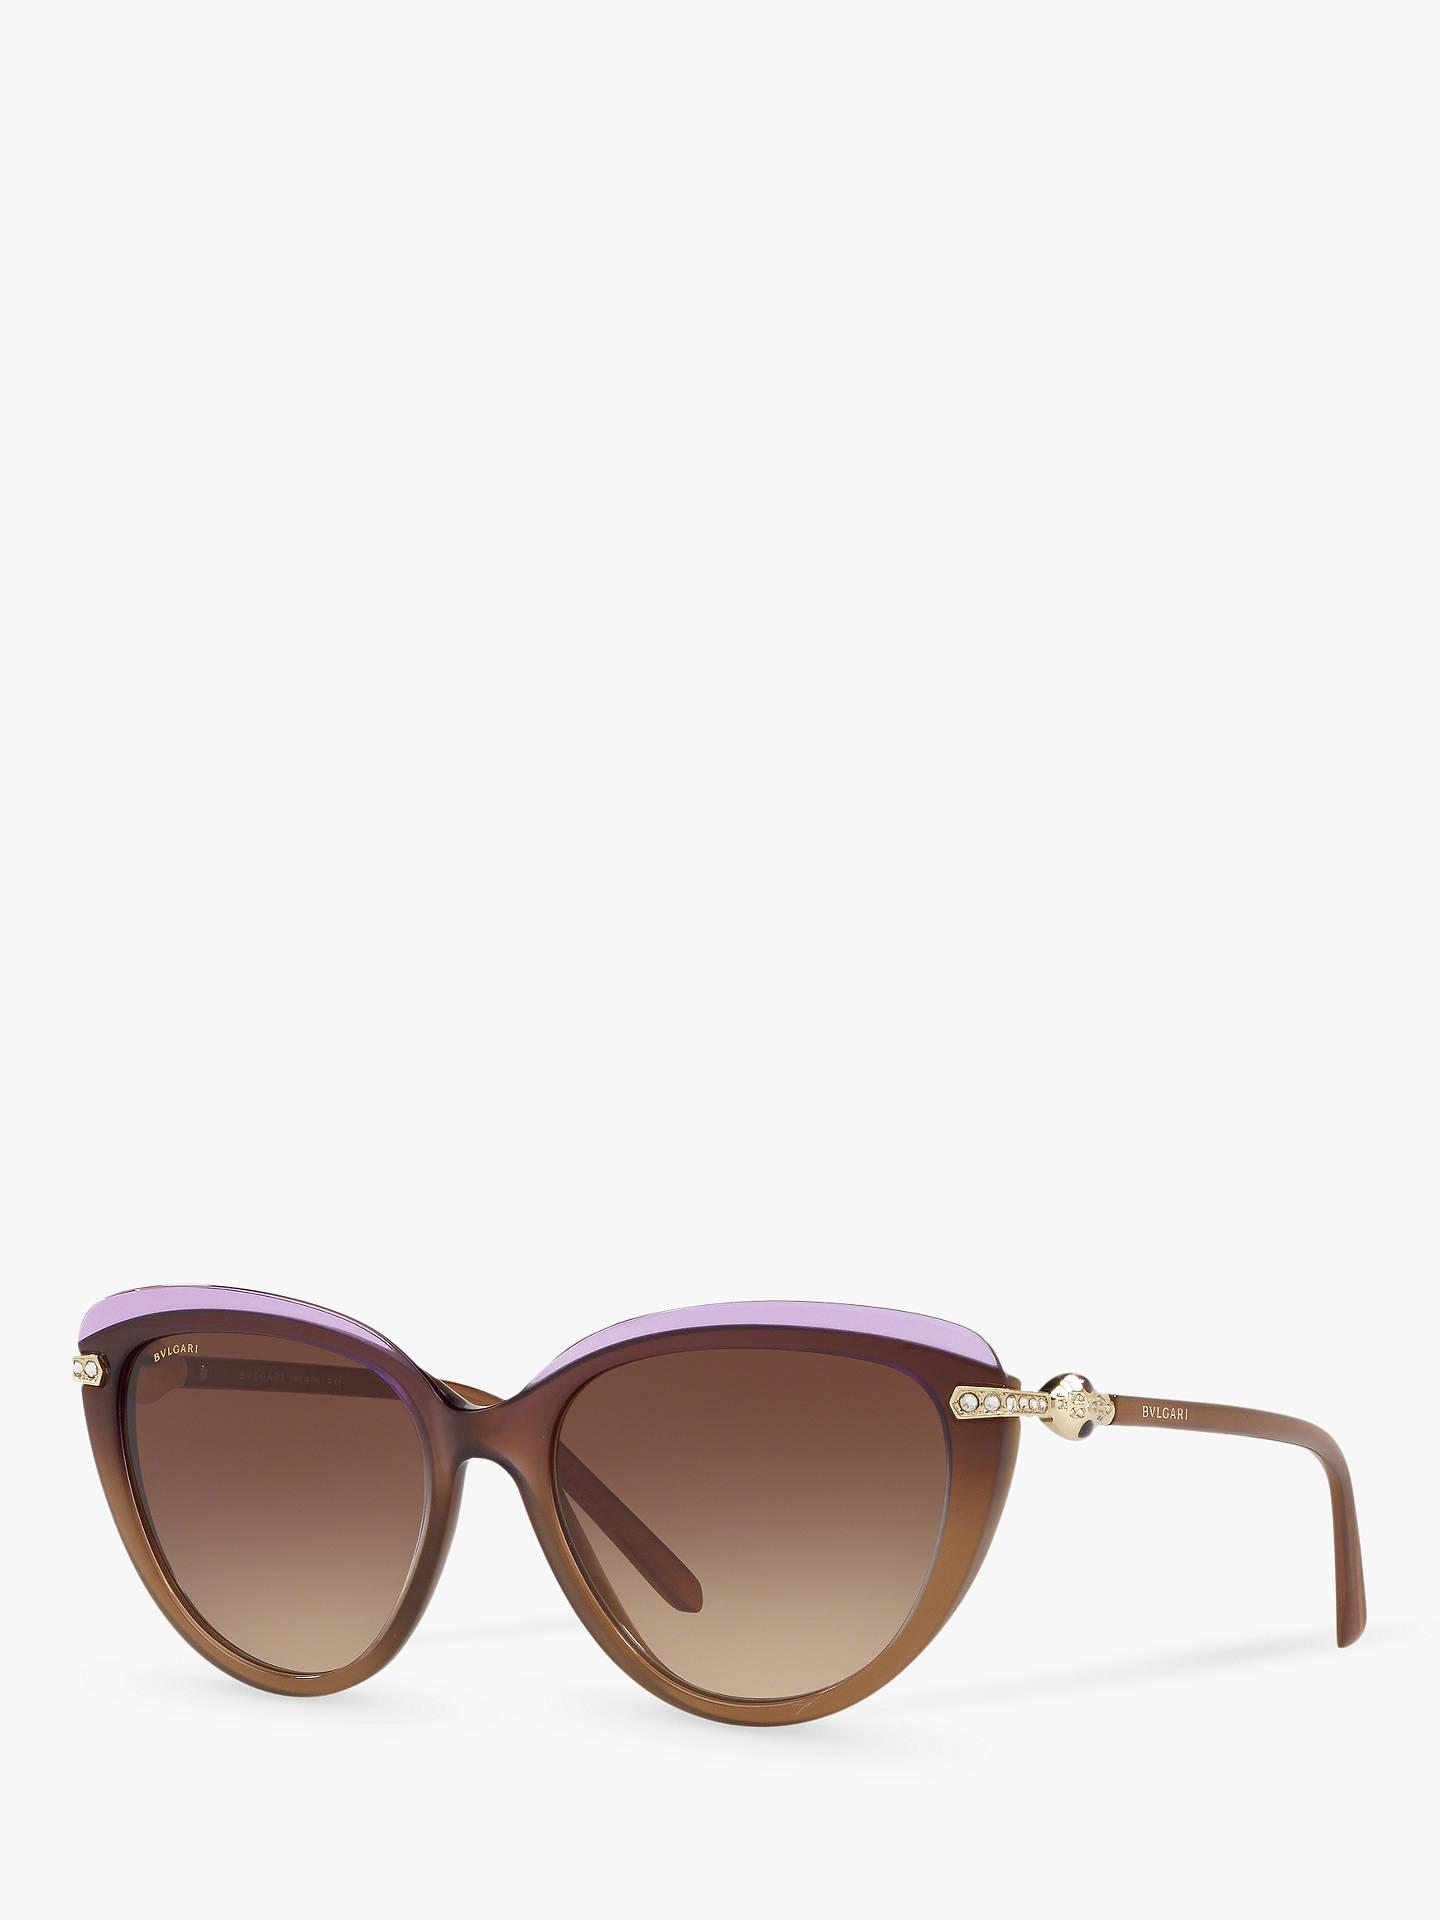 79ac9ebcf5967 BVLGARI BV8211B55 Women s Cat s Eye Sunglasses at John Lewis   Partners